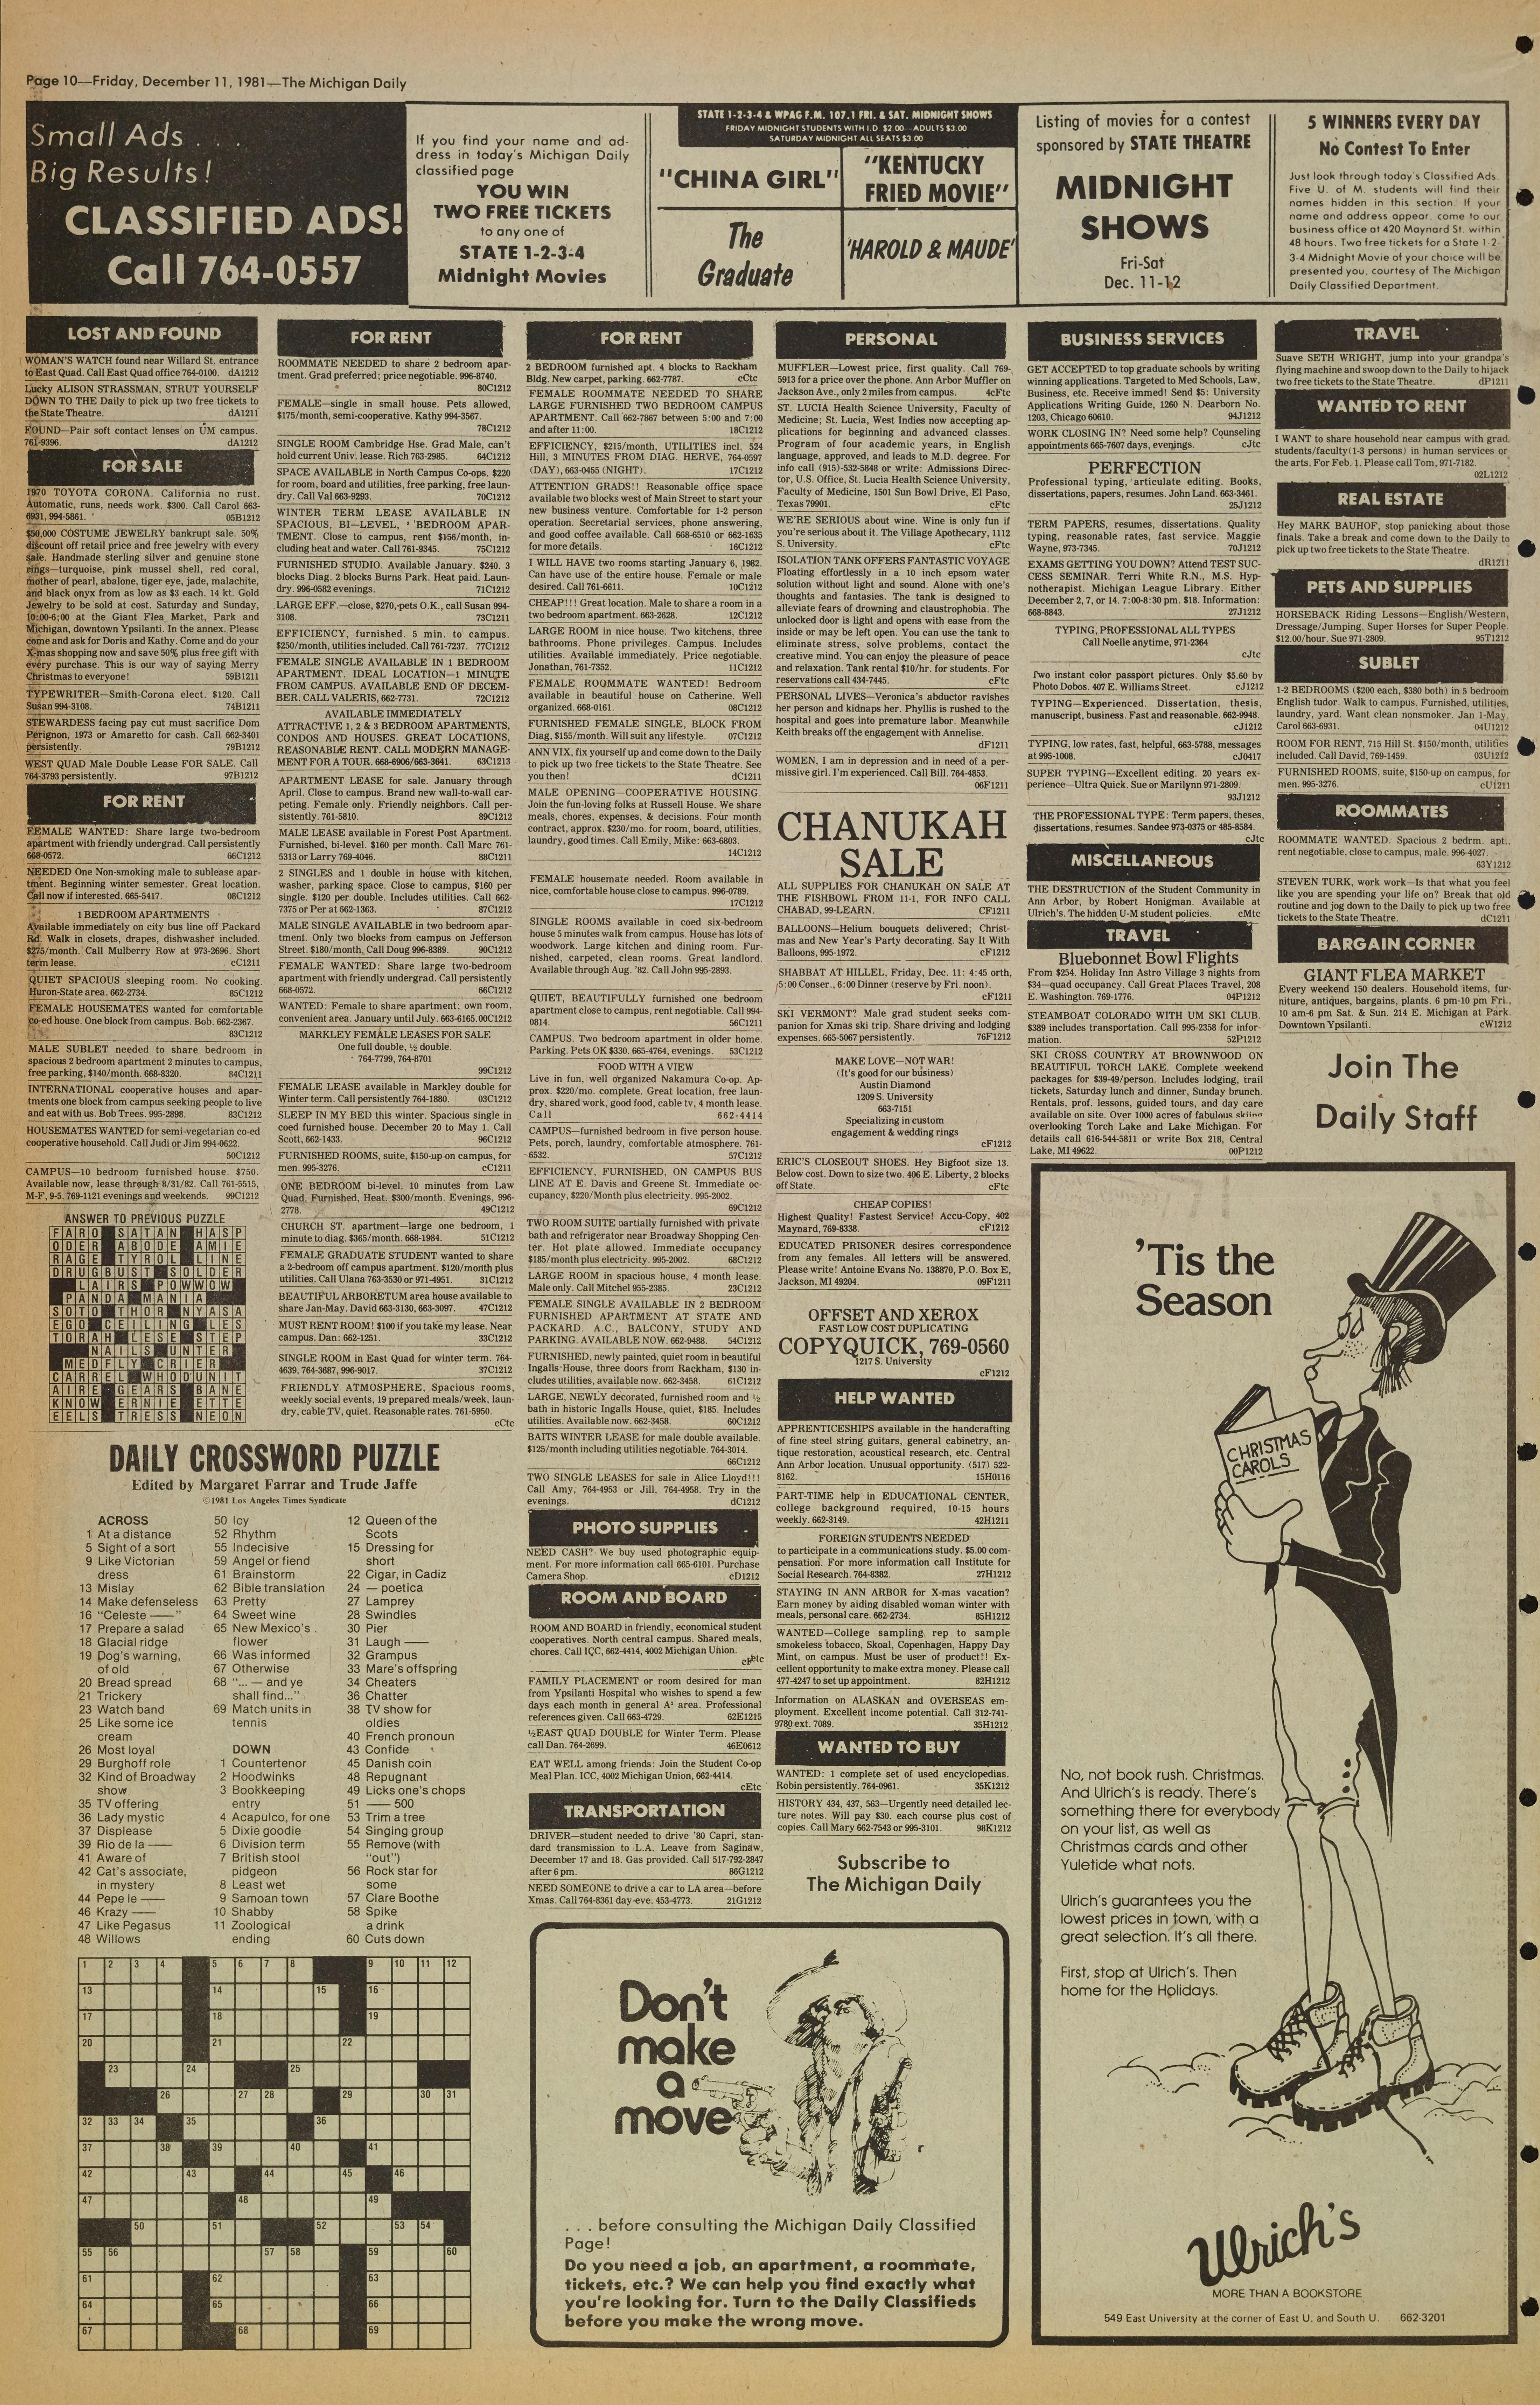 Michigan Daily Digital Archives - December 11, 1981 (vol  92